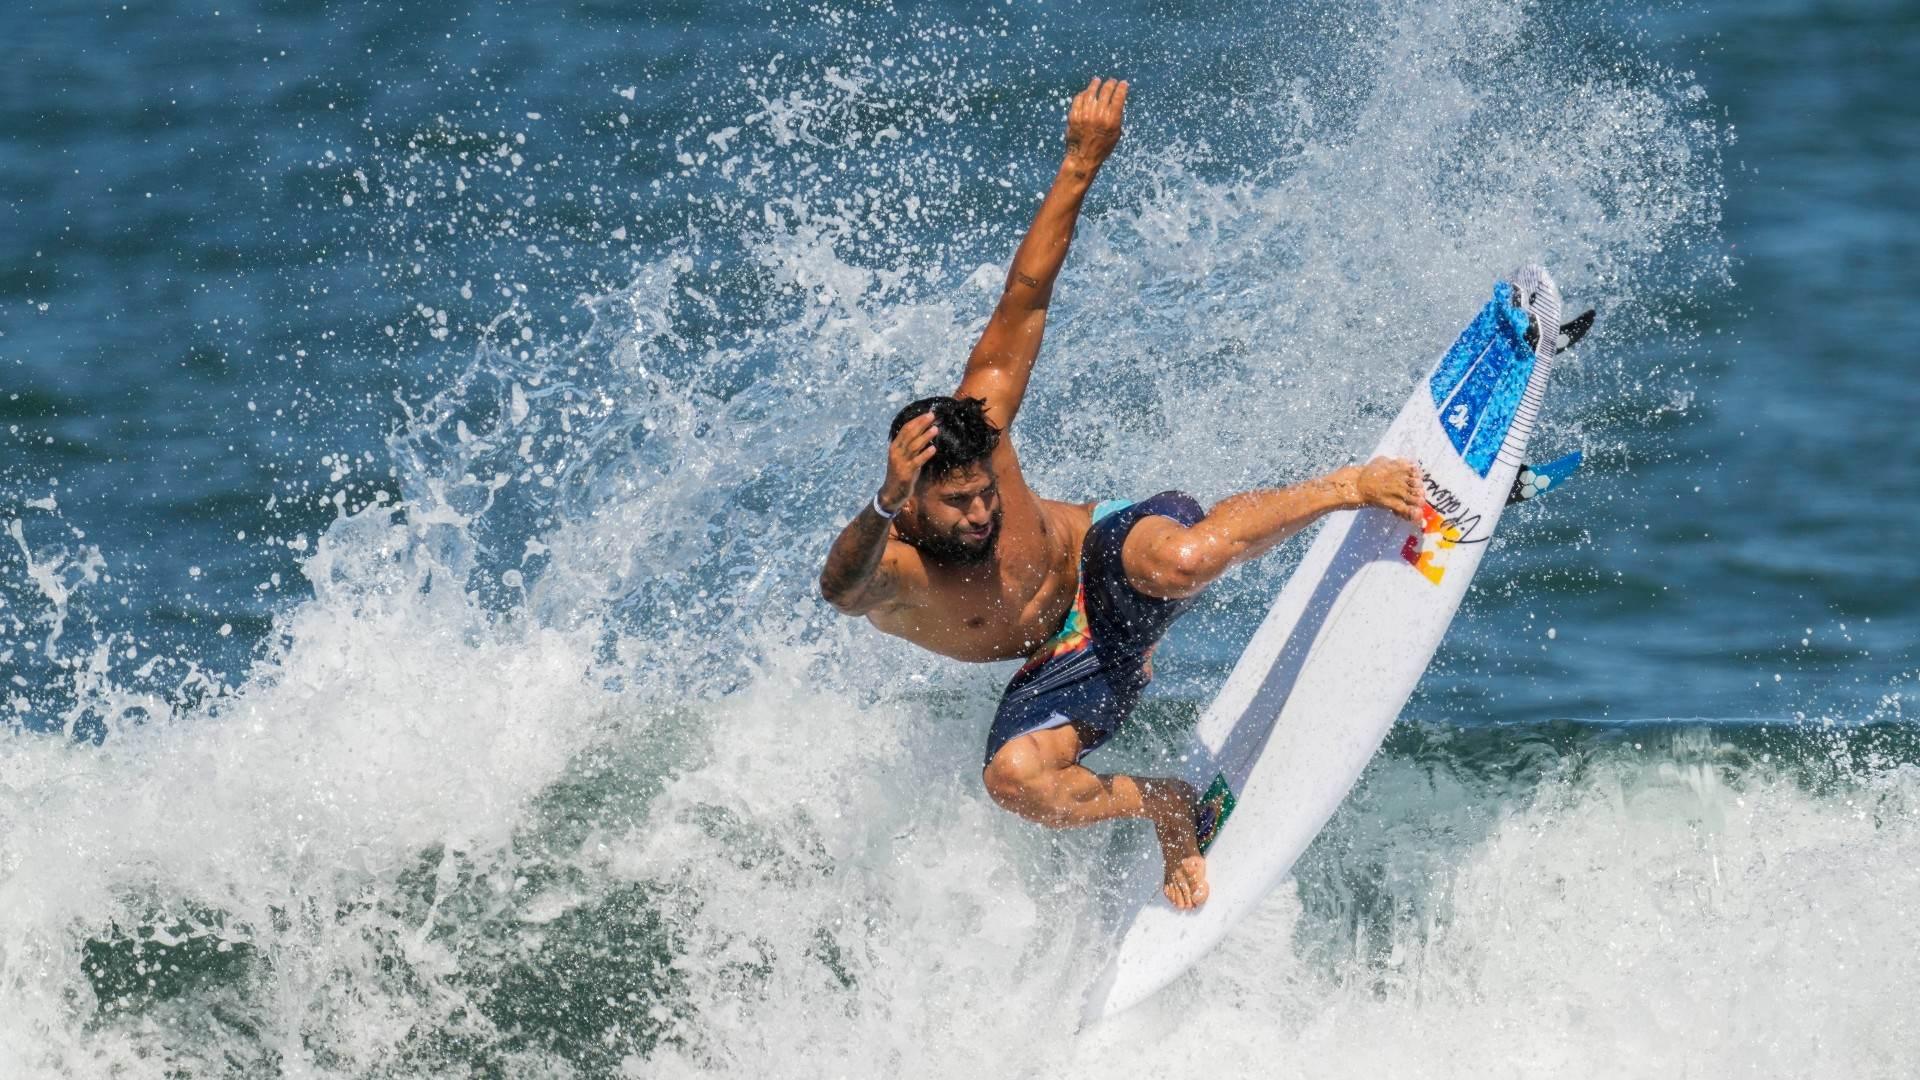 O surfista brasileiro Ítalo Ferreira treina as Olimpíadas de Tóquio